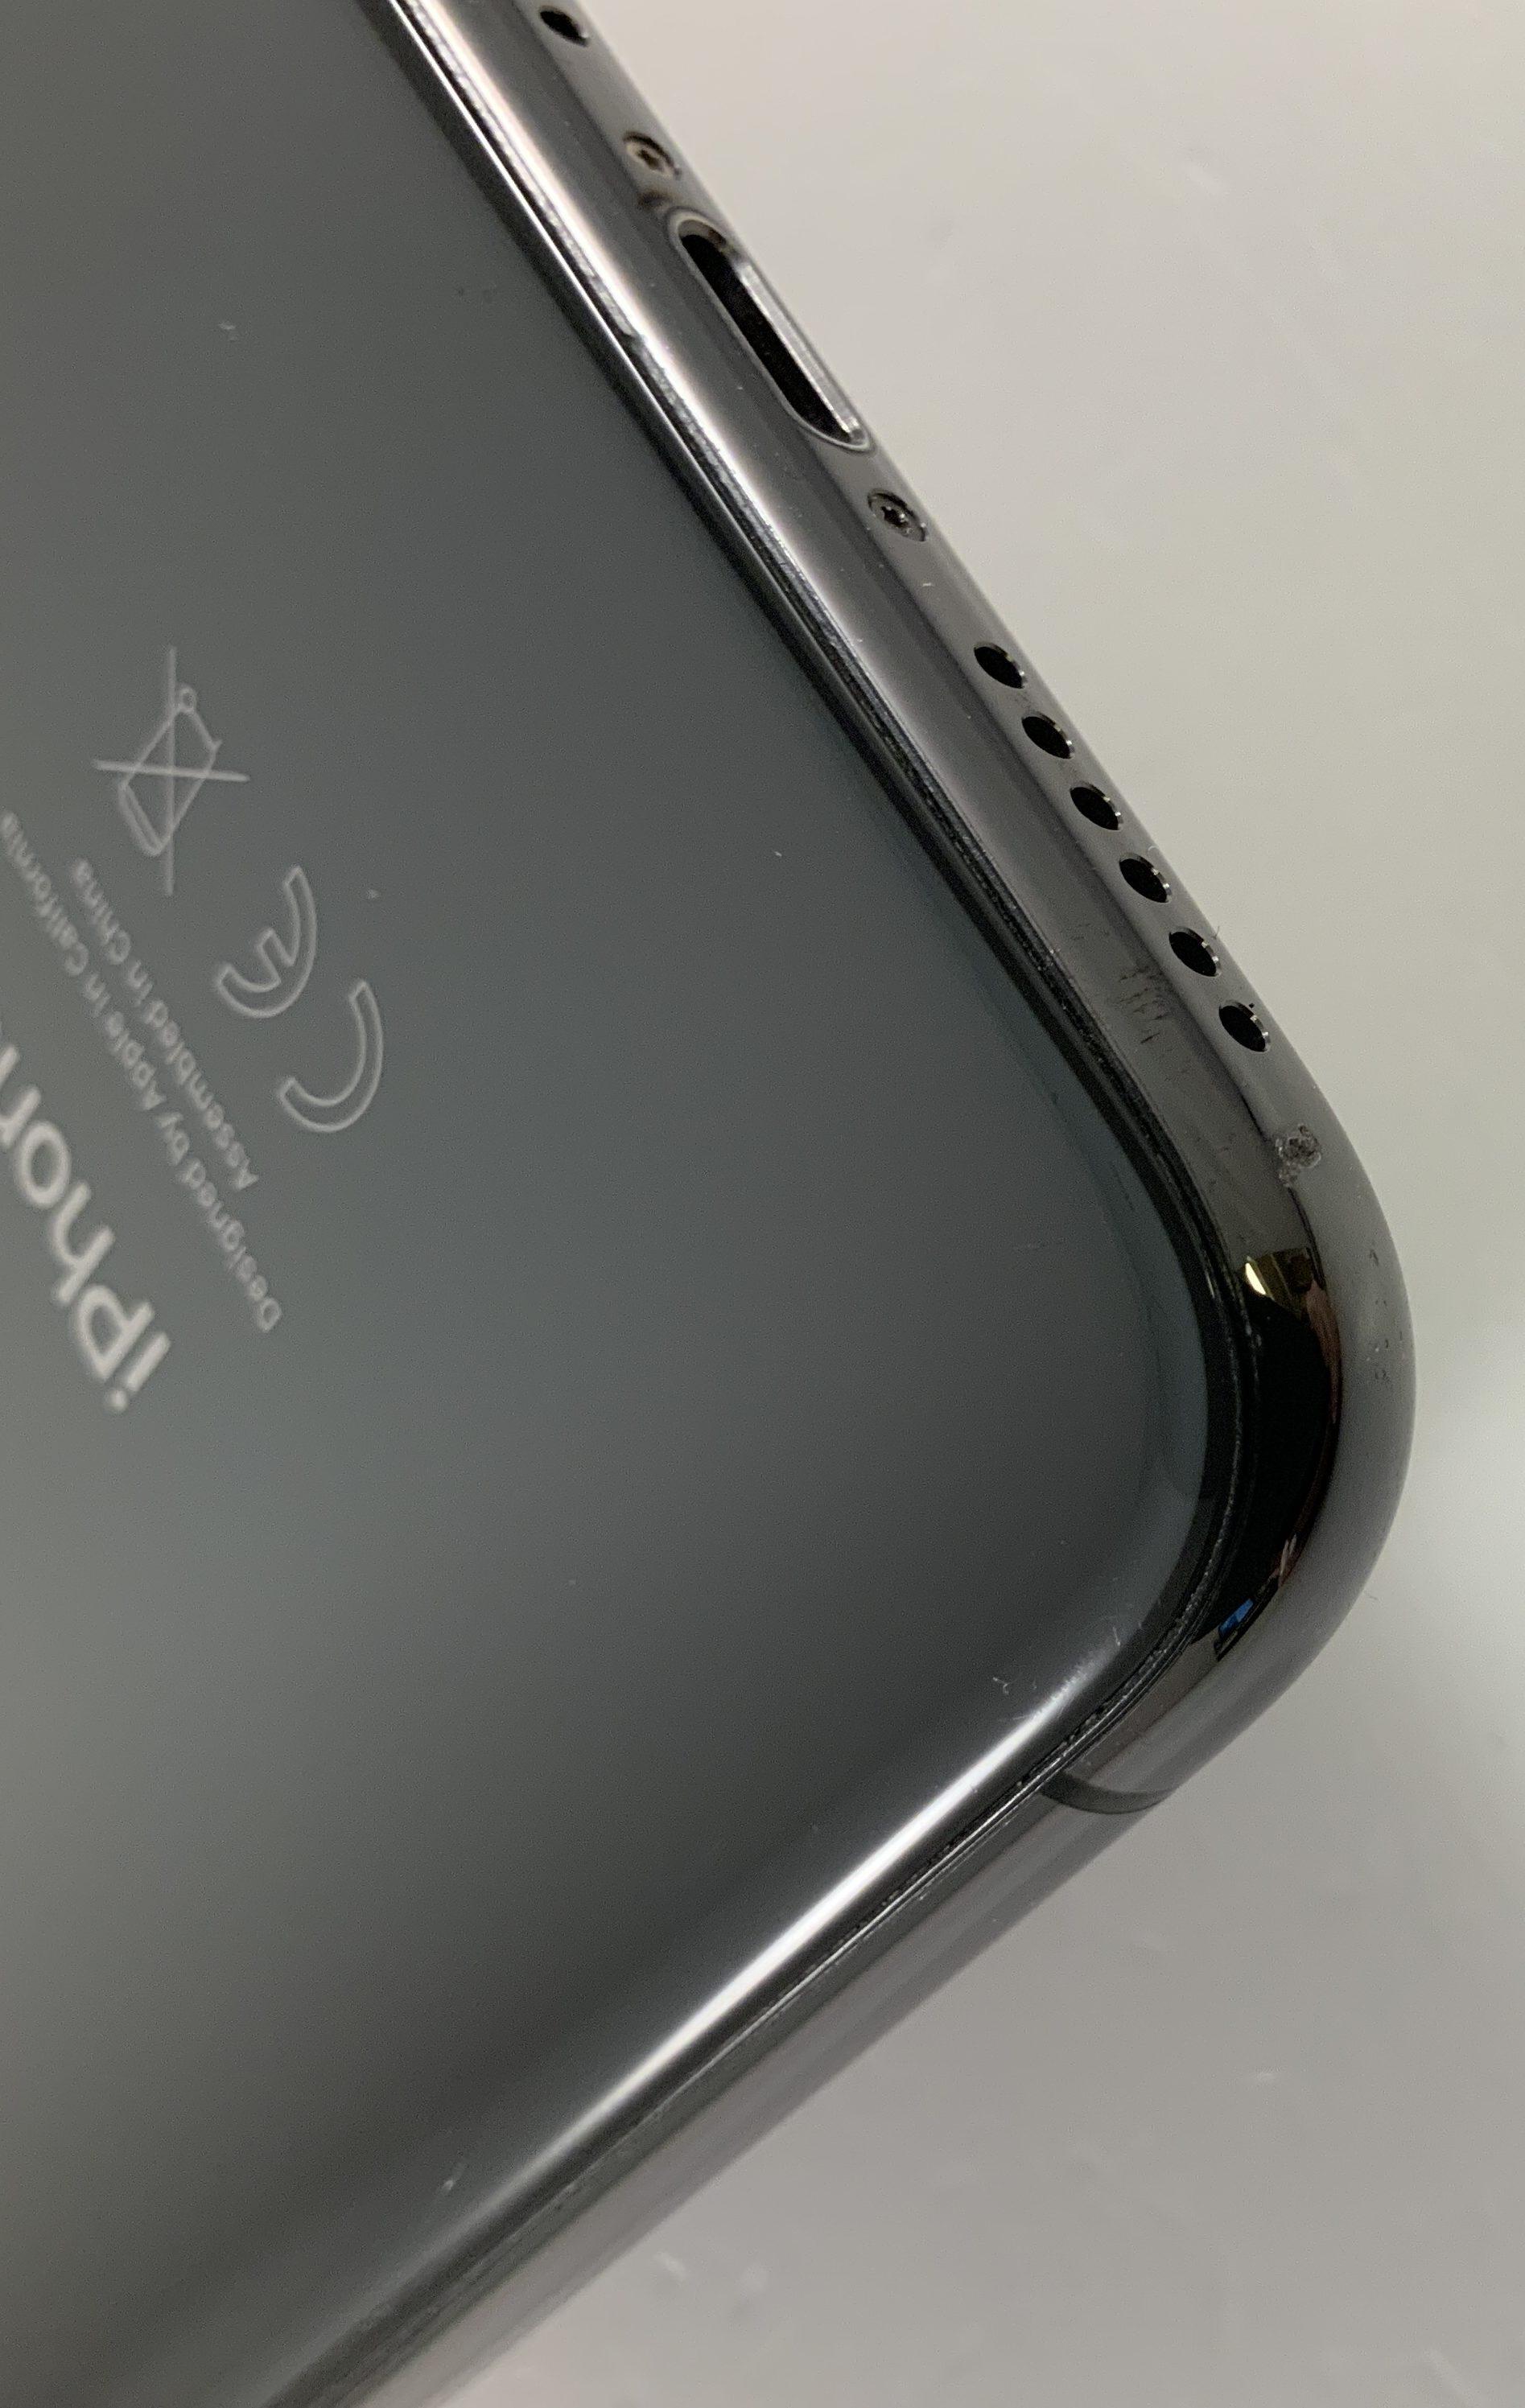 iPhone XS 256GB, 256GB, Space Gray, obraz 5